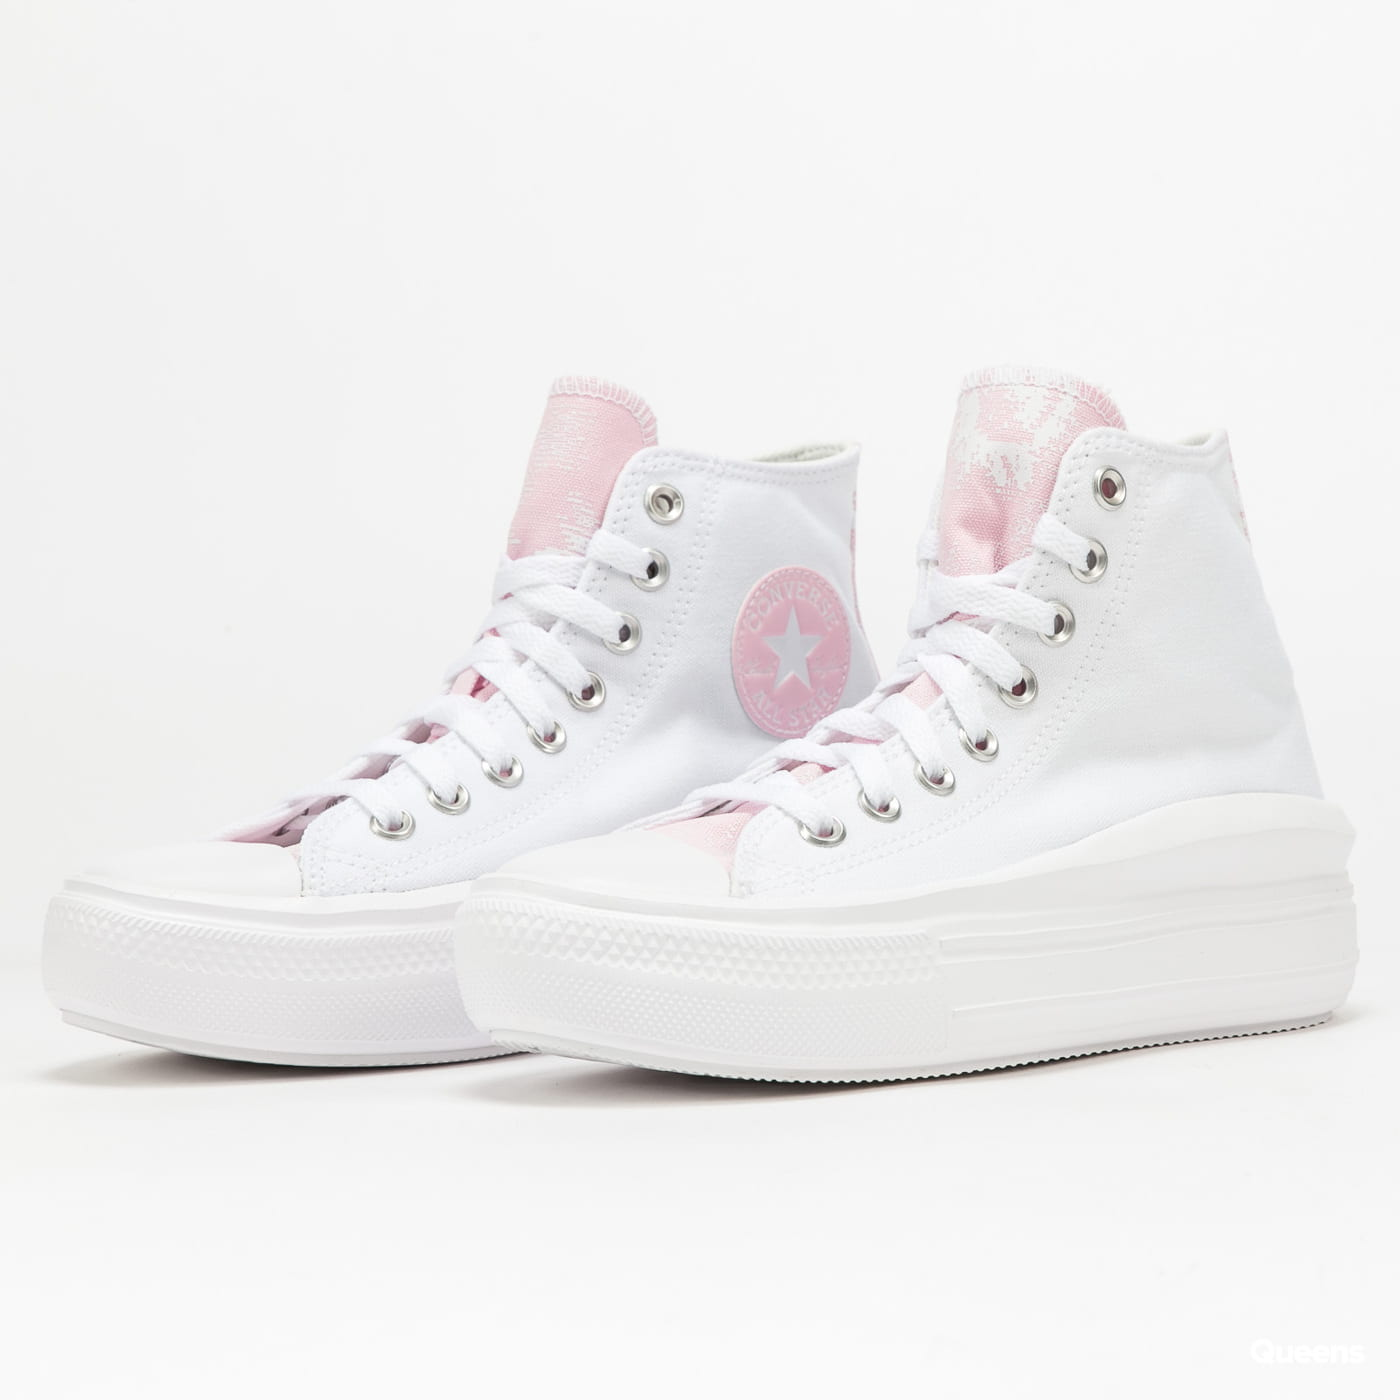 Converse Chuck Taylor All Star Move Hi white / pink foam / white